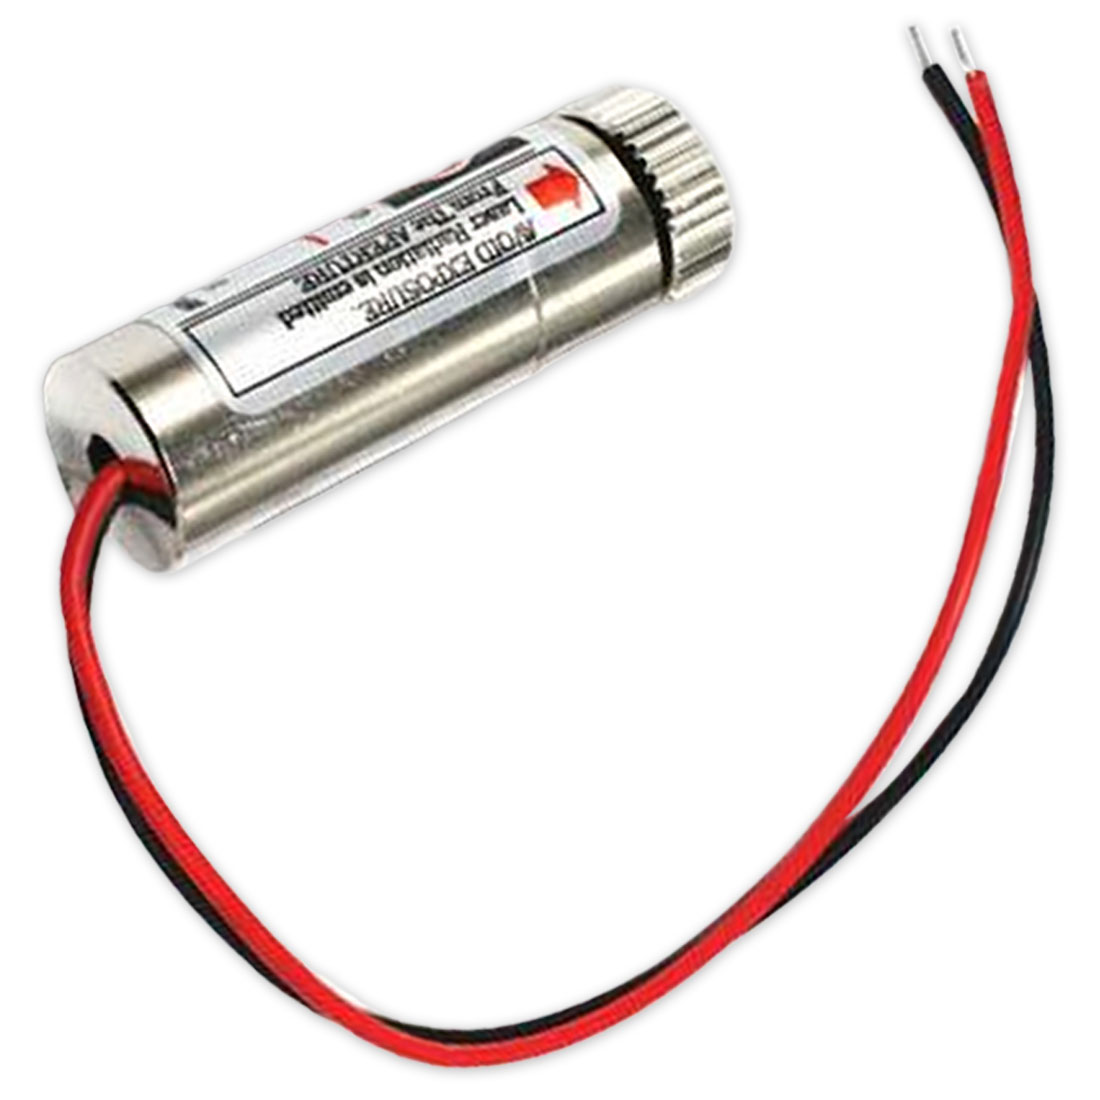 Adjustable Beam Infrared Diode Module Red Dot Base Set Positioning 5V Marking Locator For DIY CO2 Laser Engraving Cutting Head